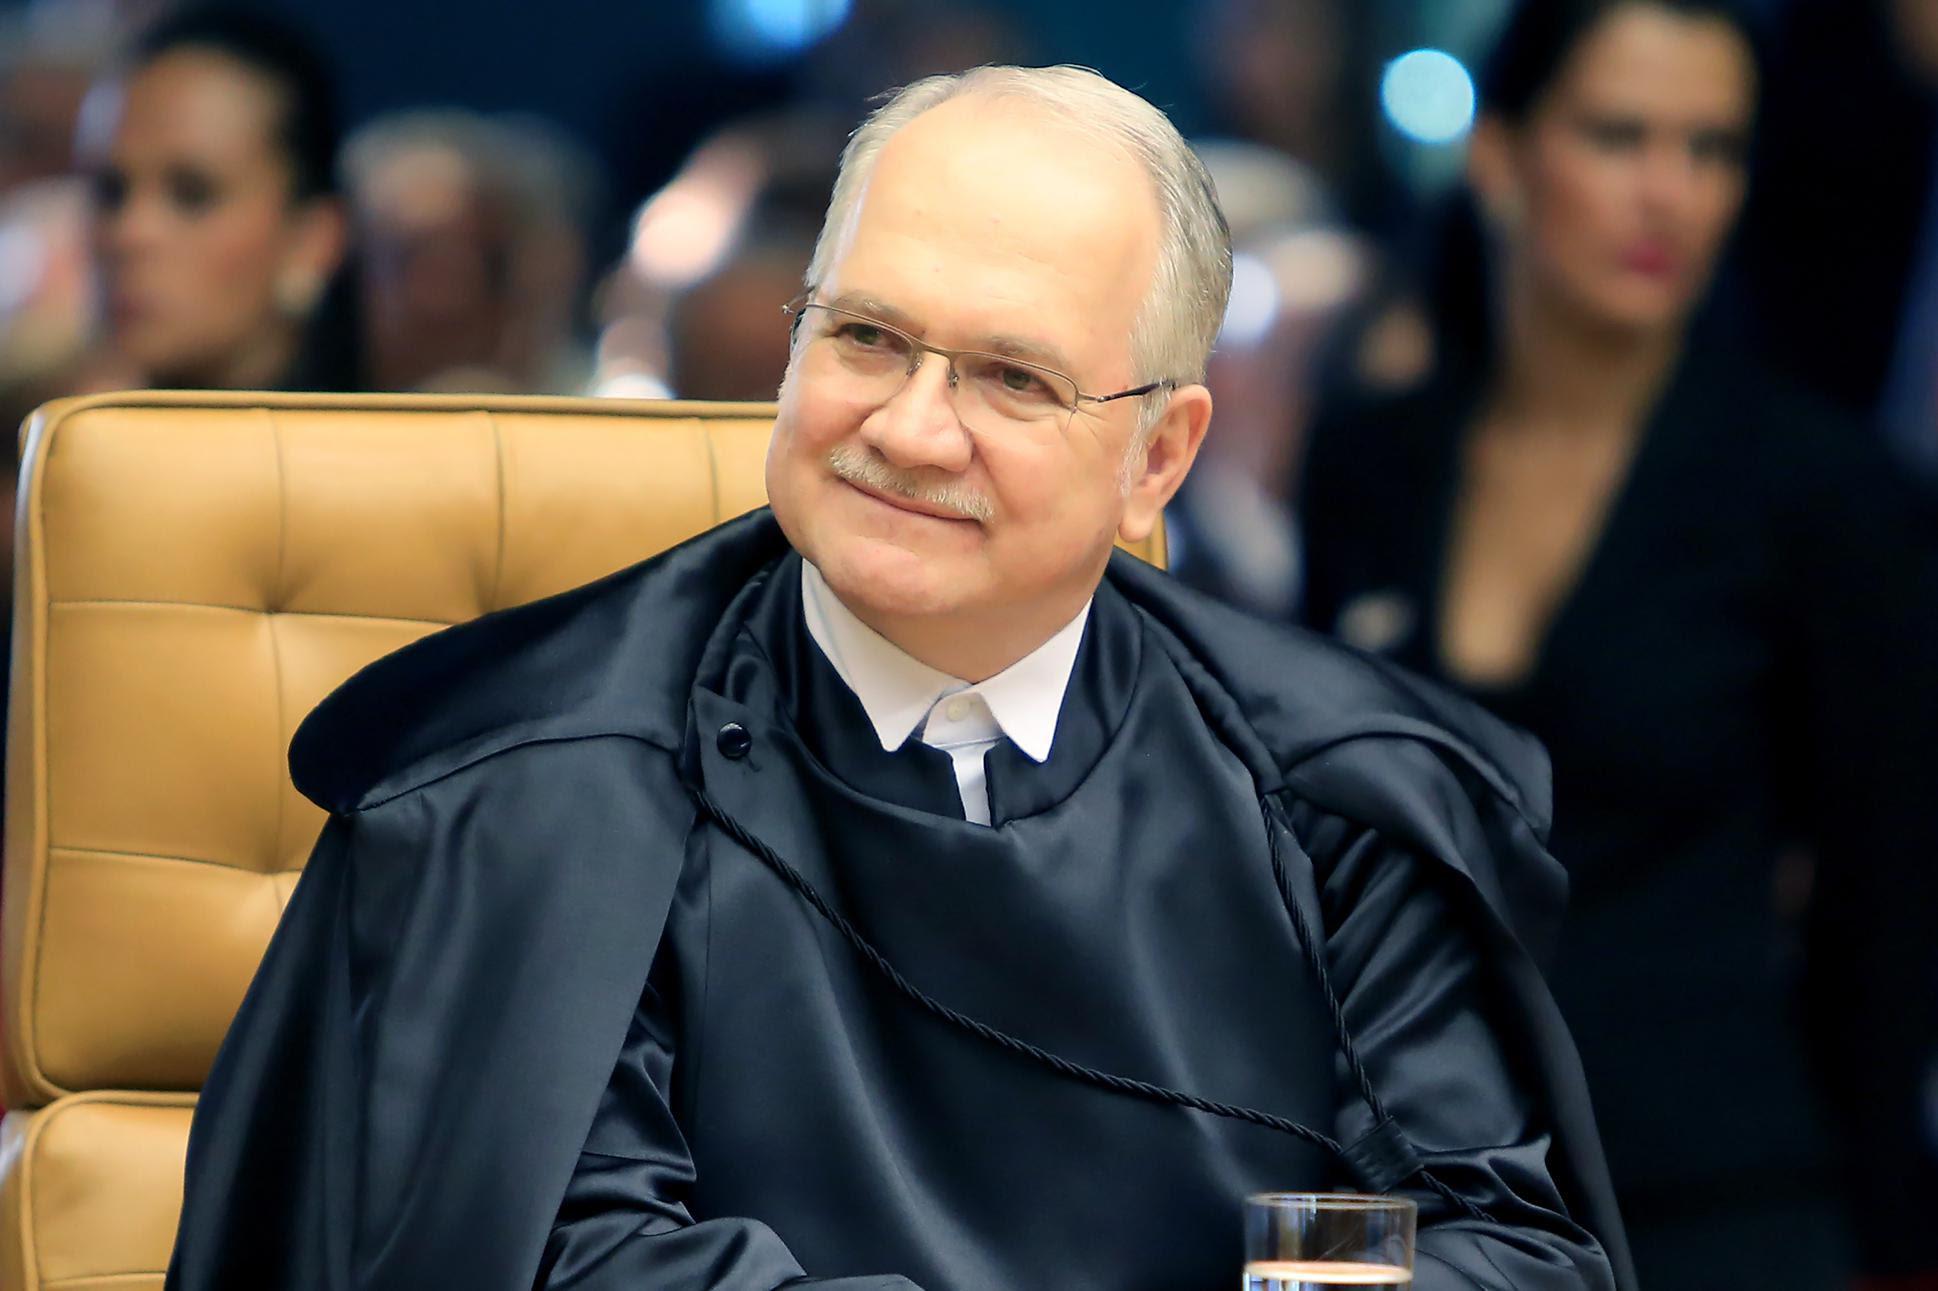 Brasília- DF- Brasil- 16/06/2015- Ministro Luiz Edson Fachin é empossado no Supremo Tribunal Federal.  Foto: Fellipe Sampaio/SCO/STF